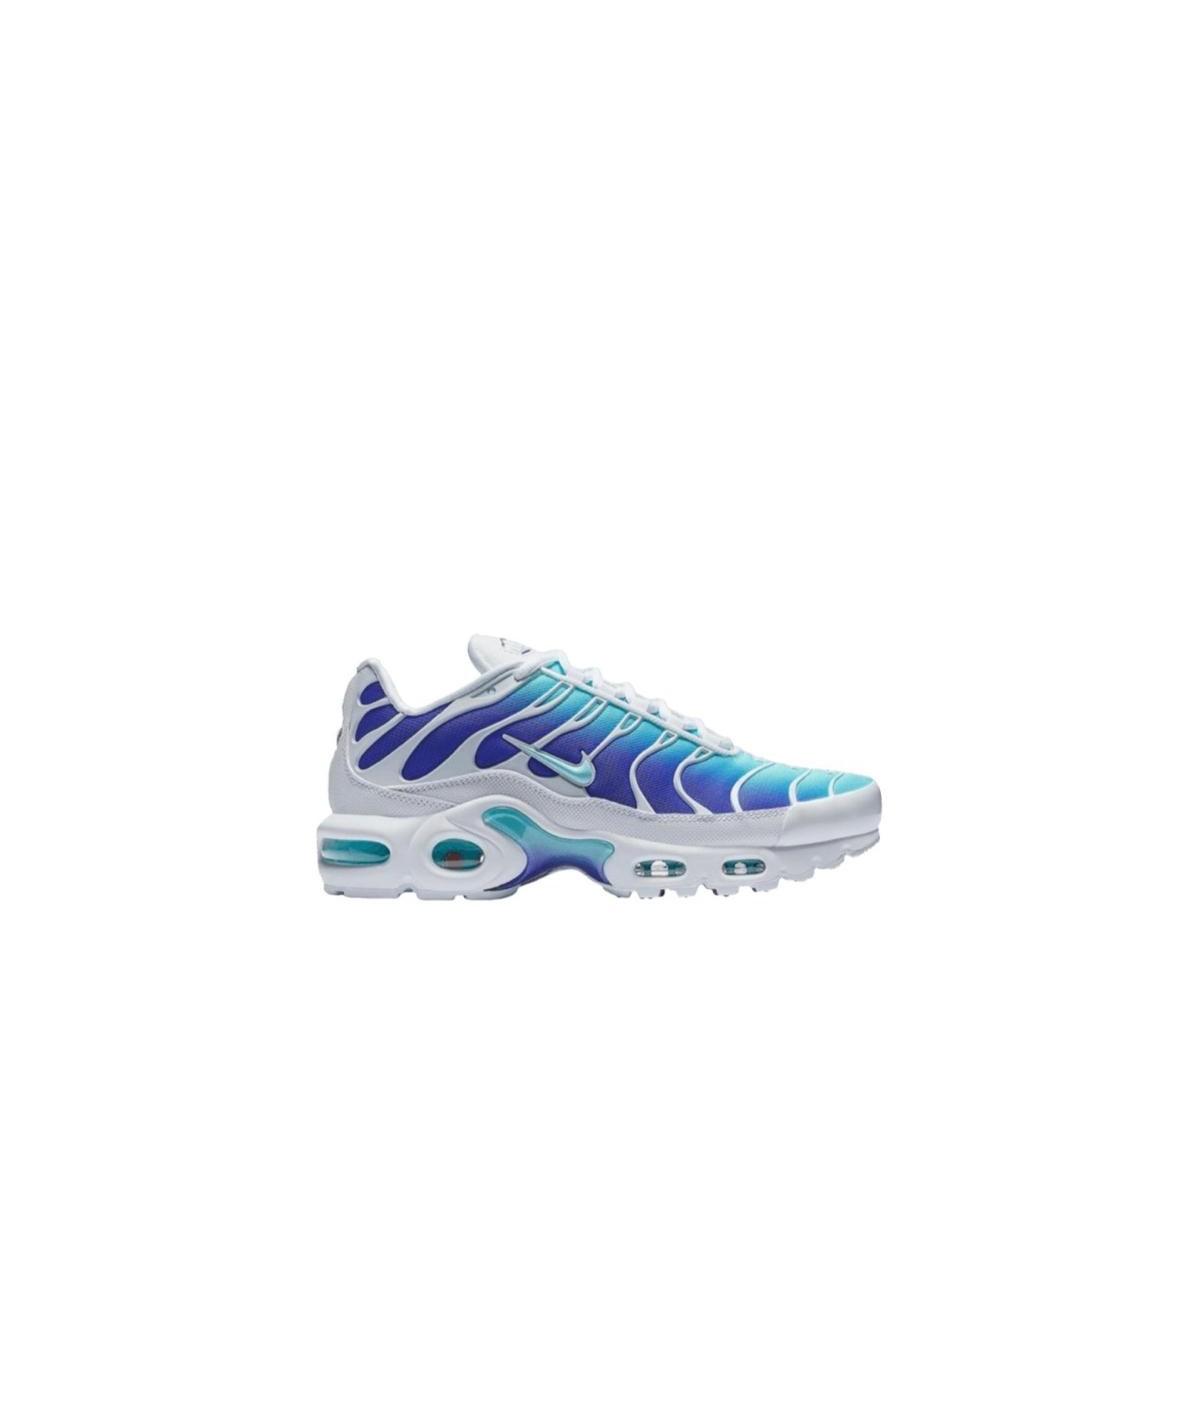 Nike Air Max Plus I AQ9979-100 I Sneakers Authentique I Guadeloupe